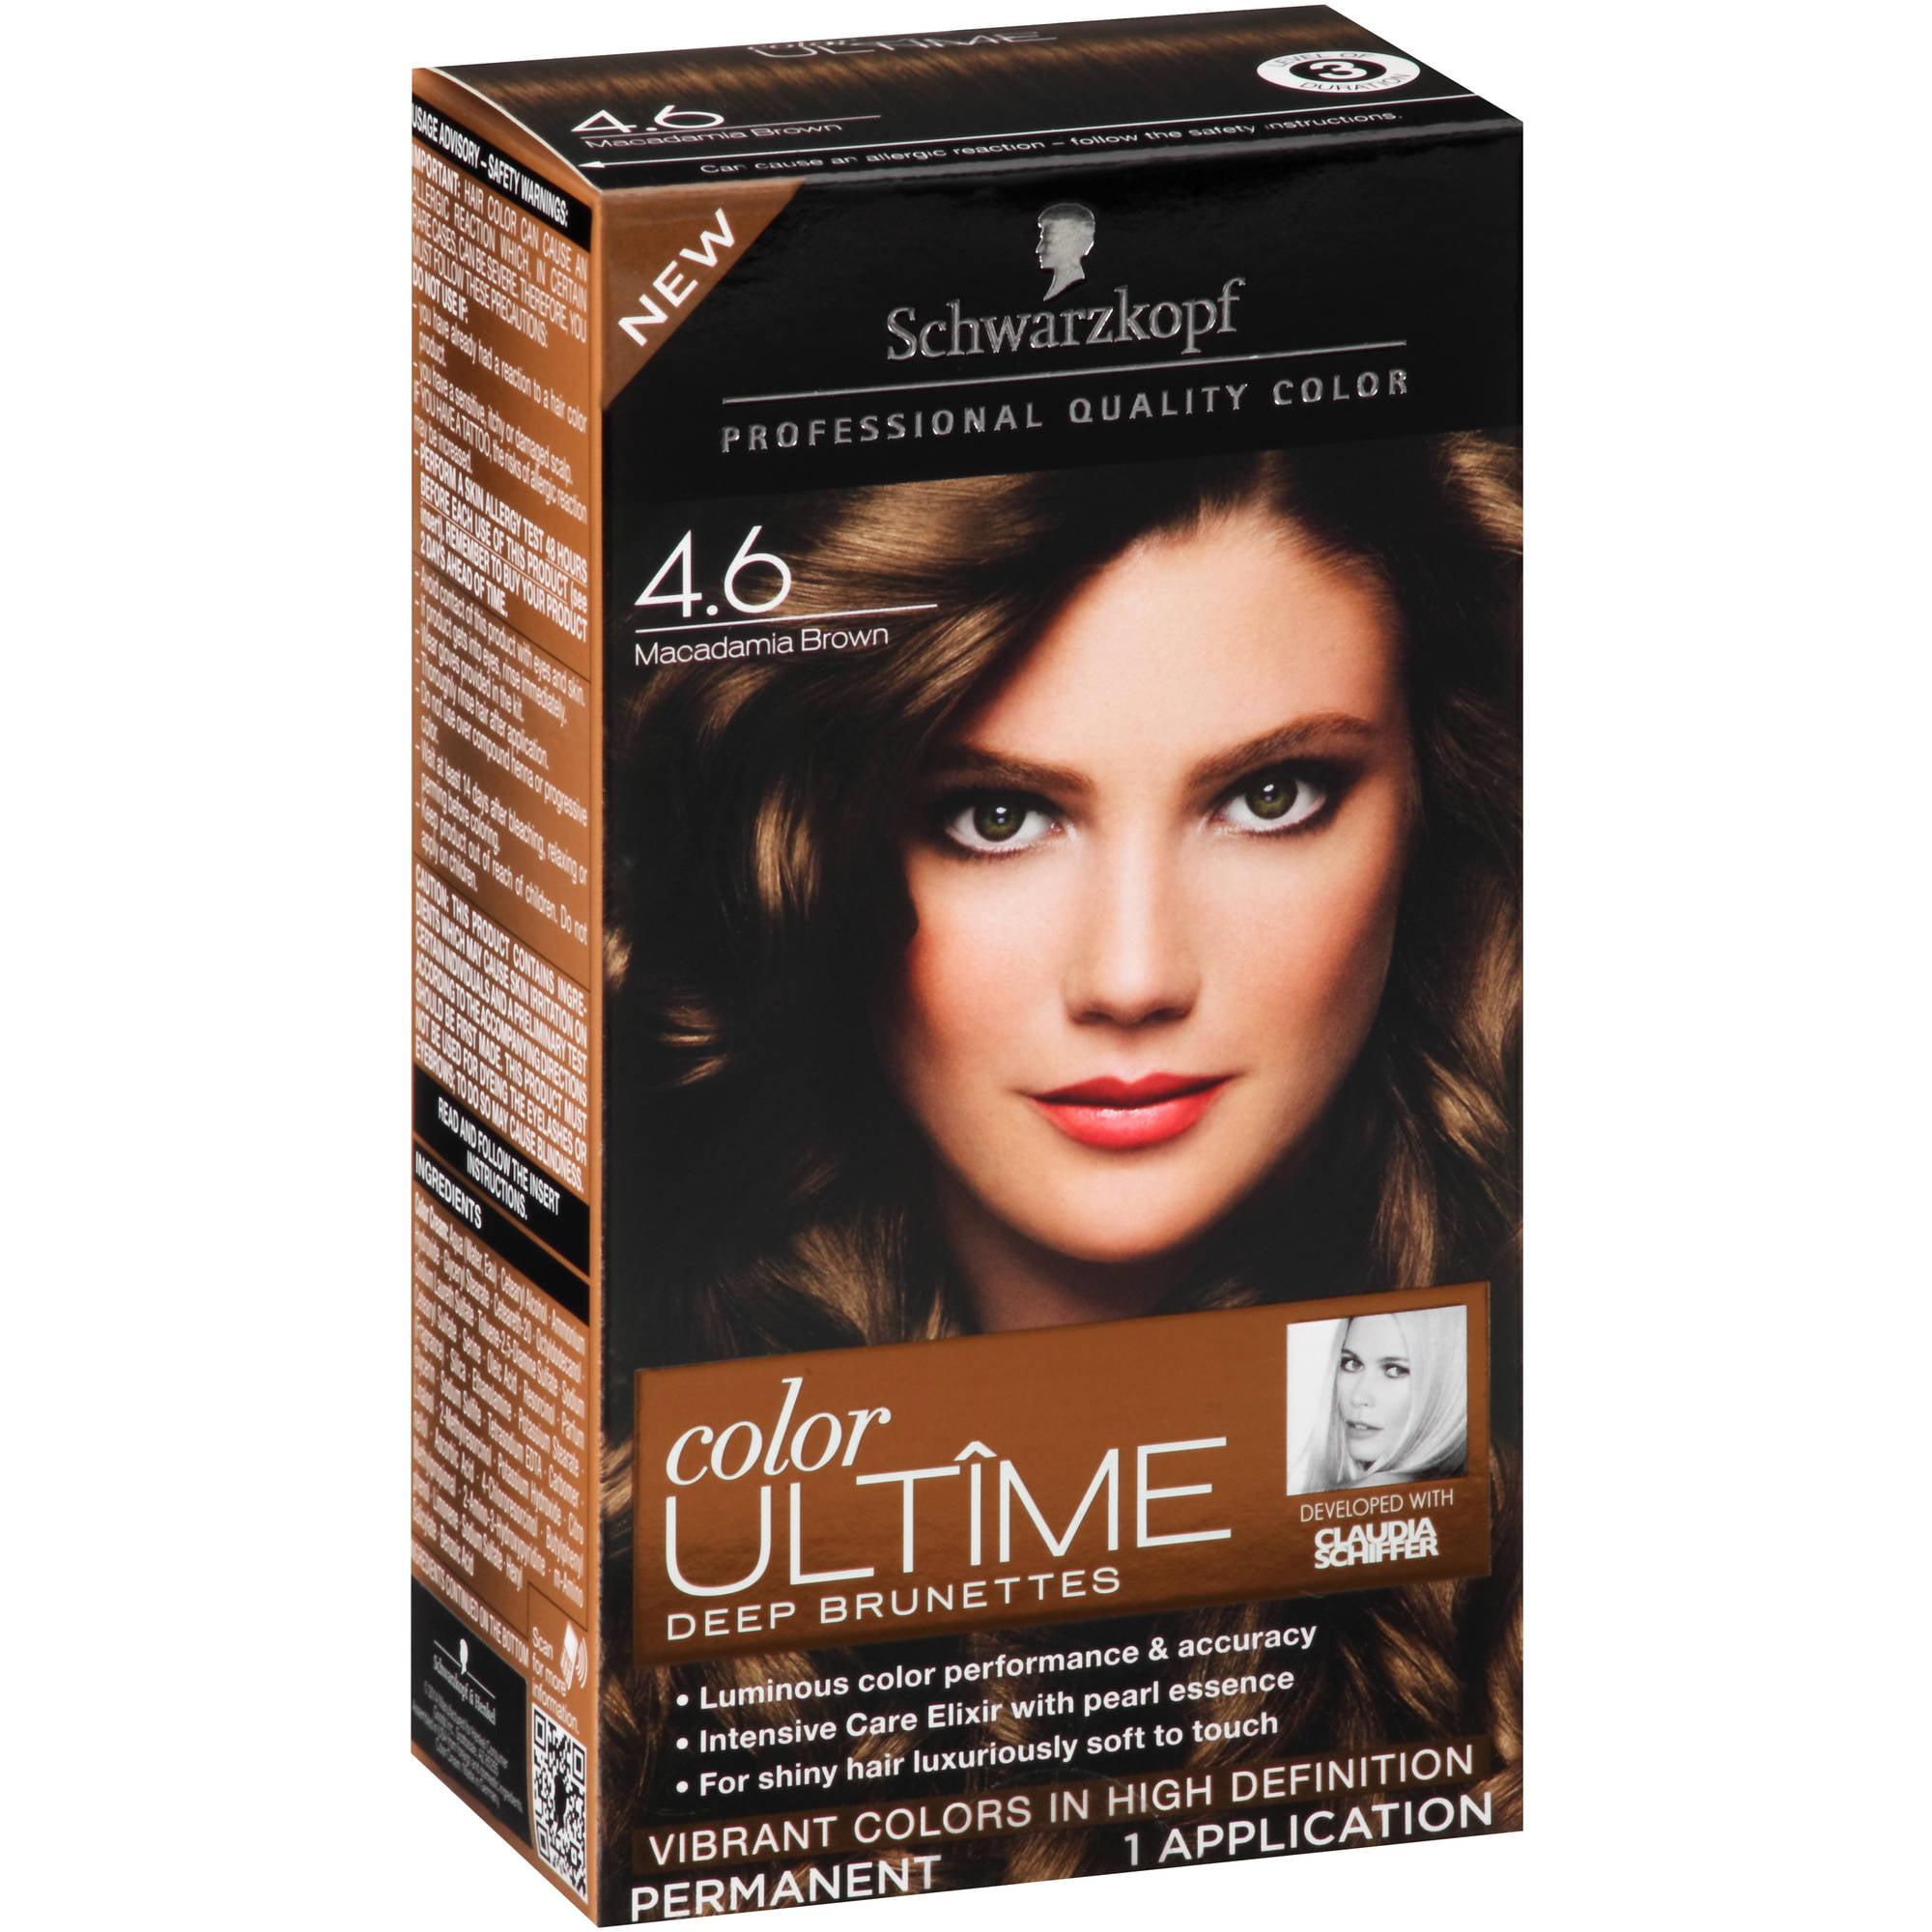 Schwarzkopf Color Ultime Deep Brunettes Hair Coloring Kit, 4.6 Macadamia Brown